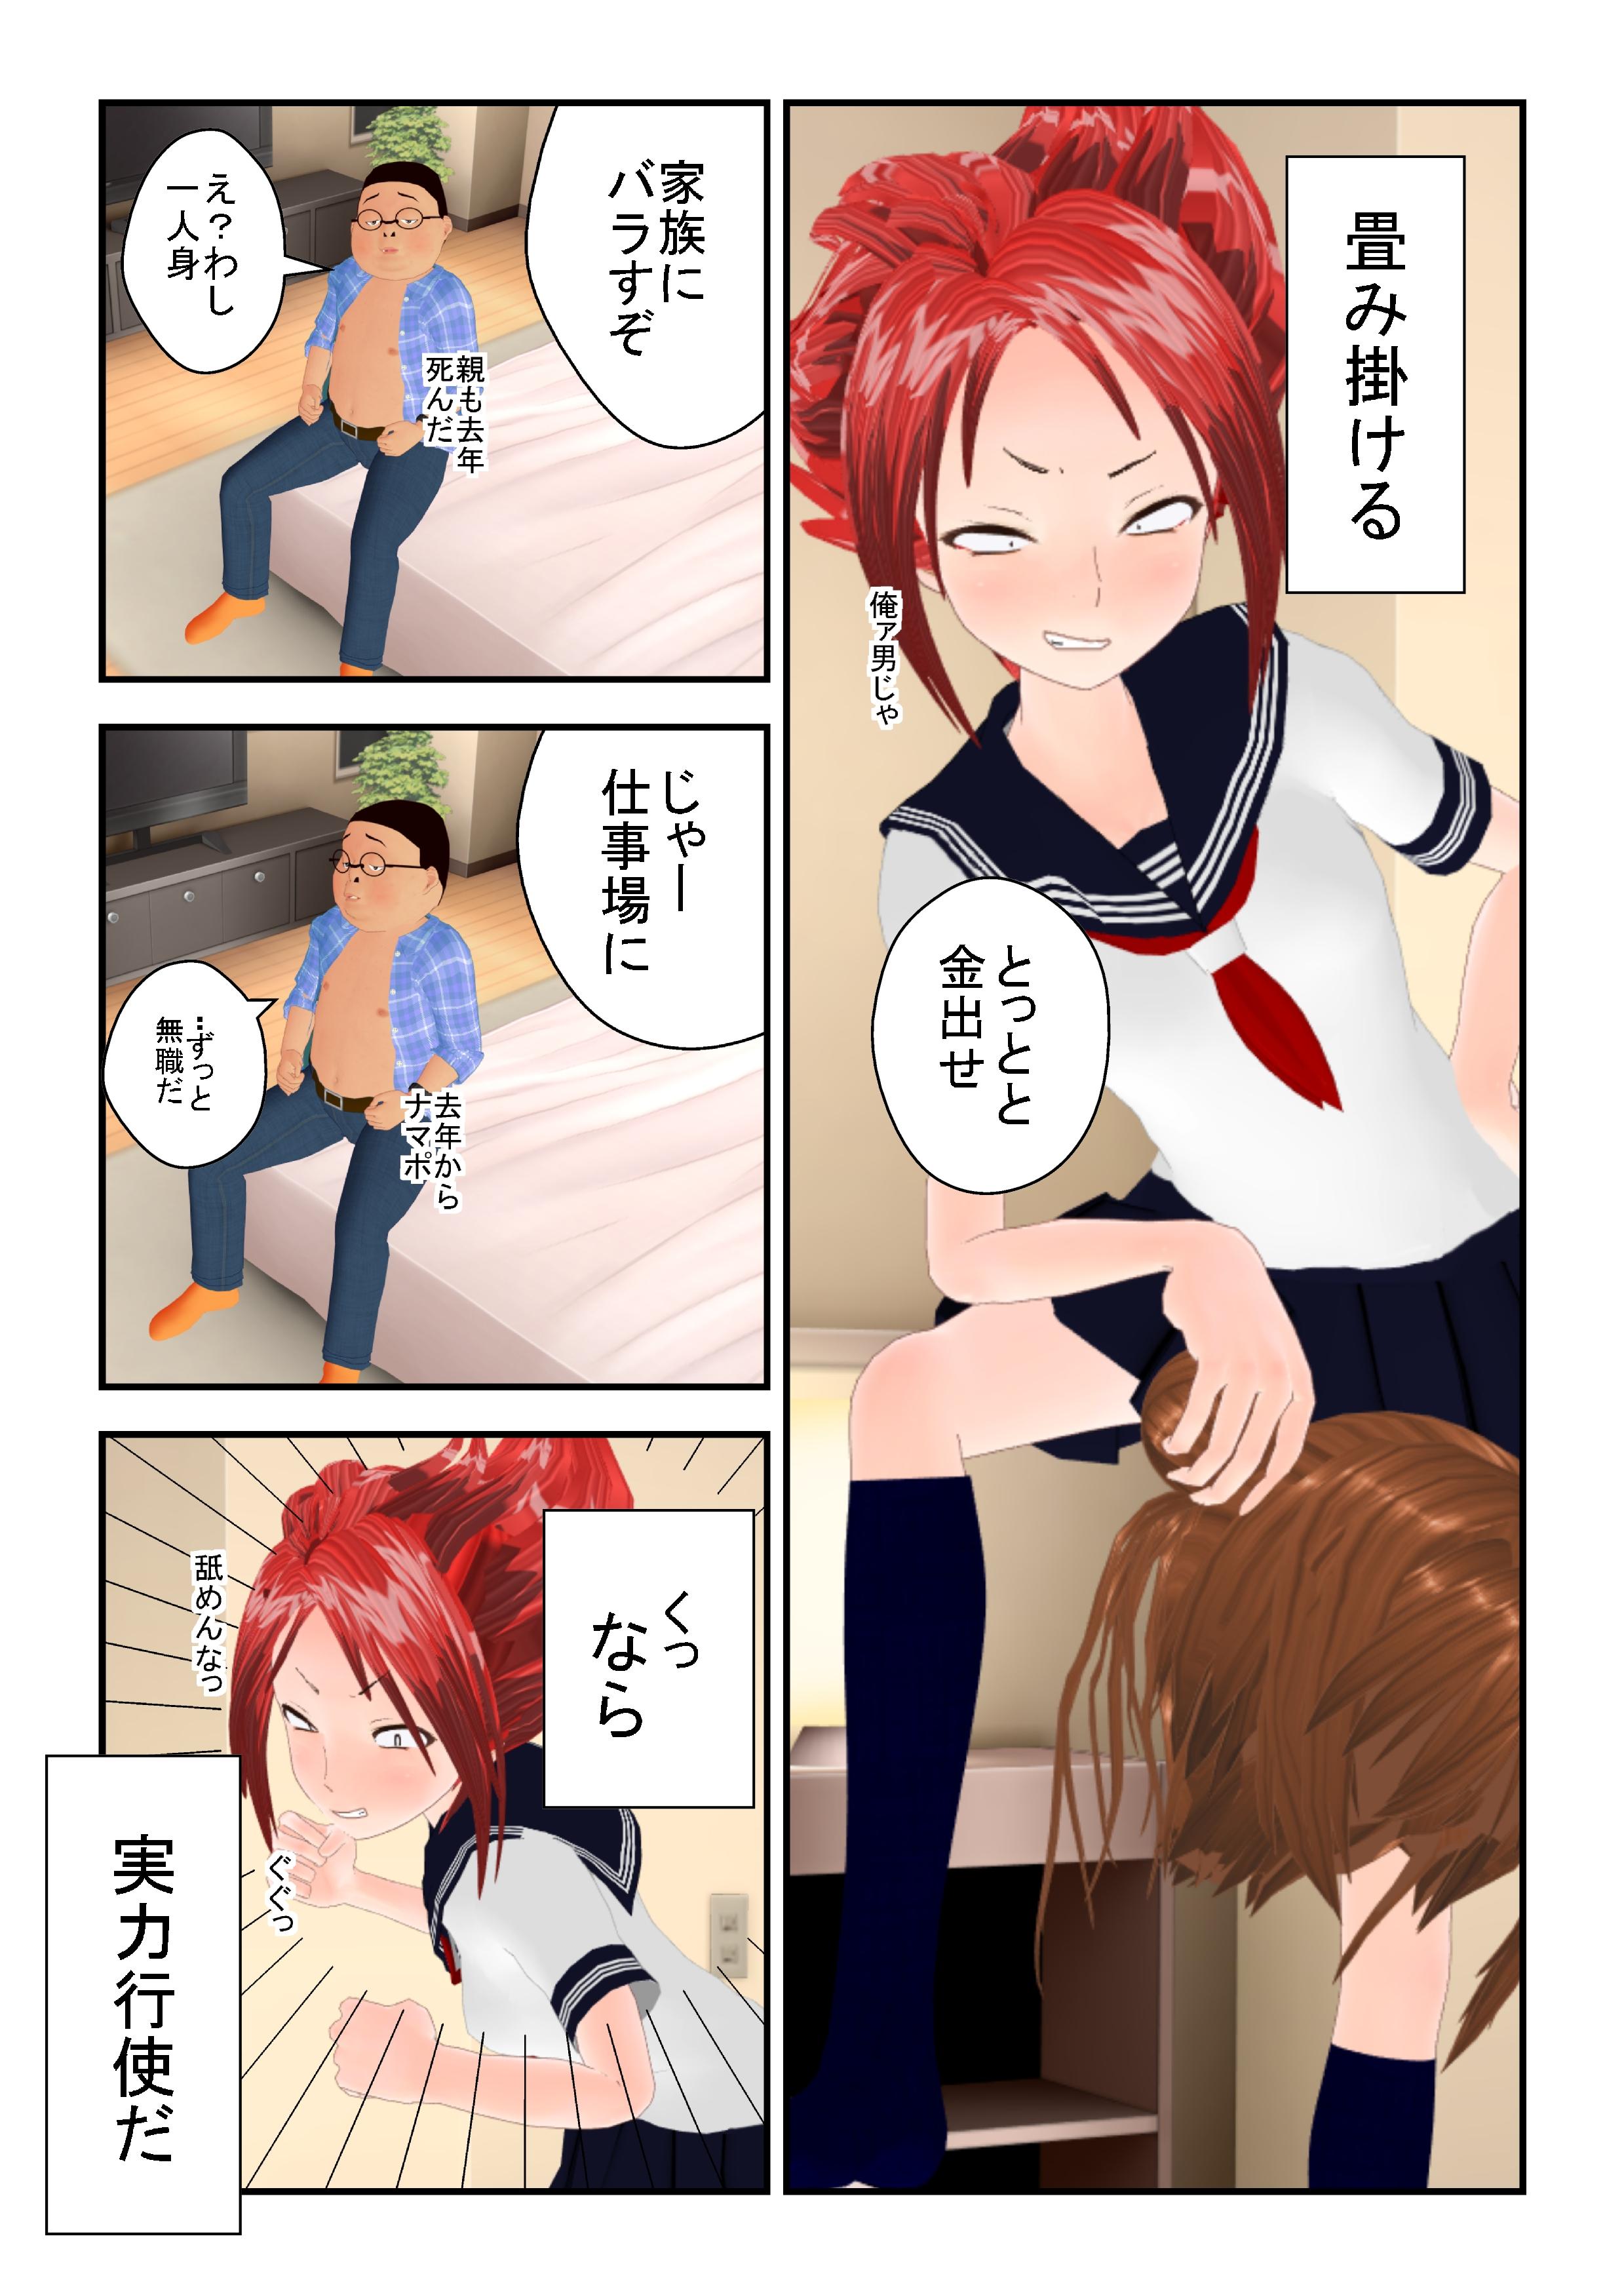 muteki_0003.jpg